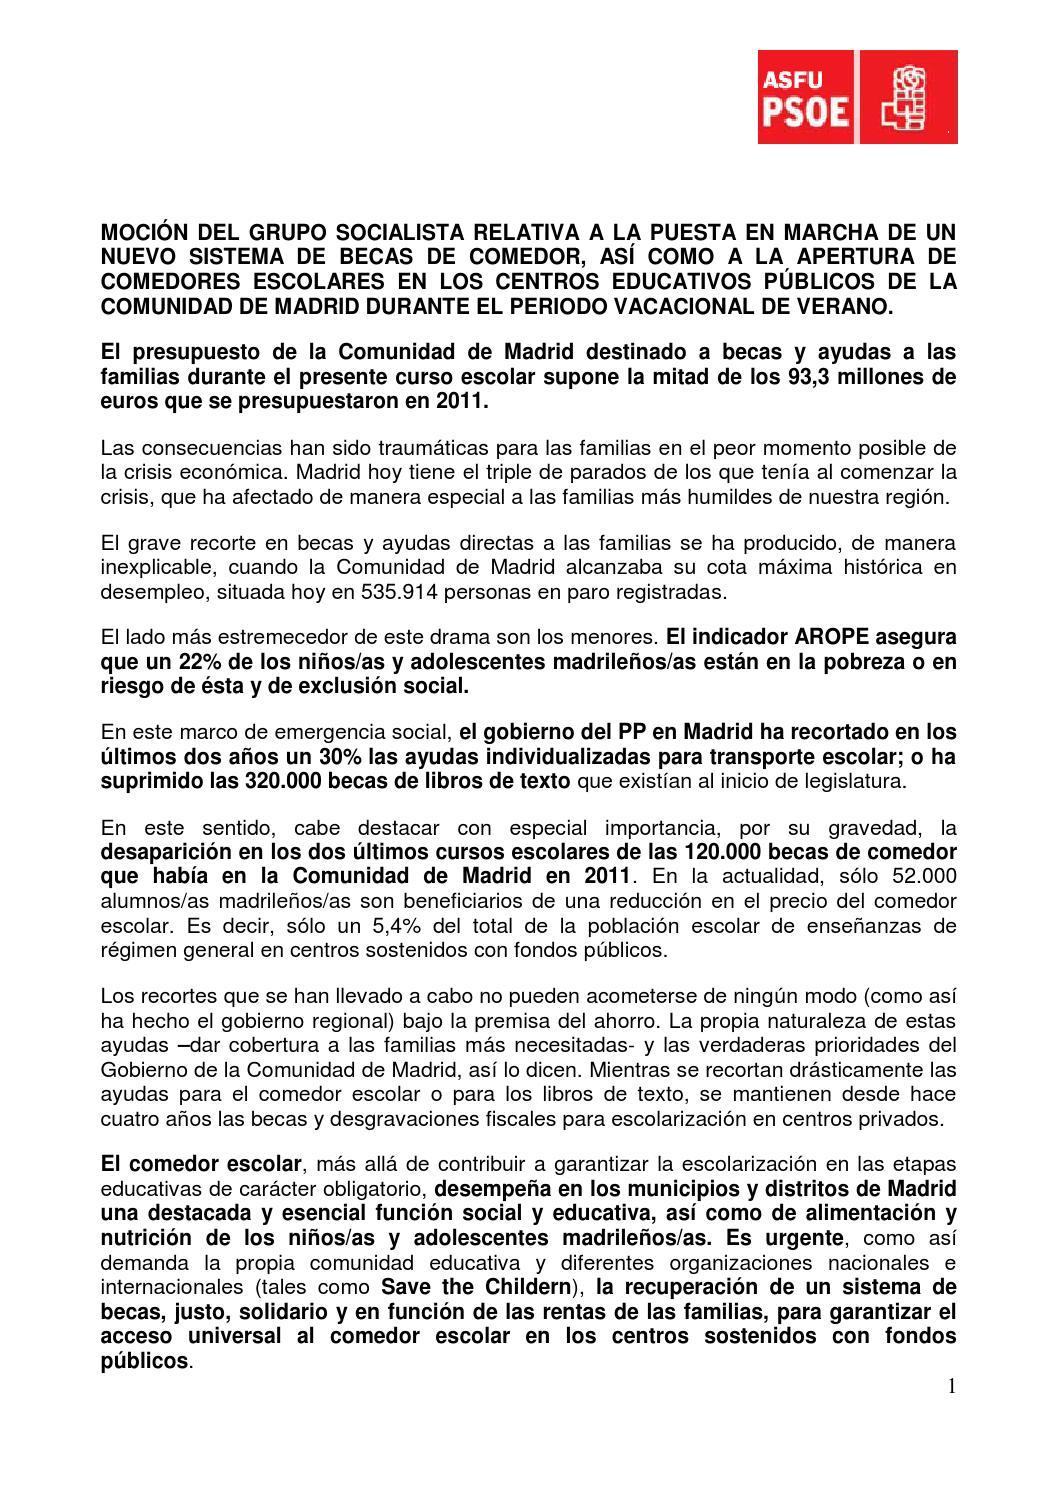 Mocion 08 08 14 comedores escolares by asfu2015 - issuu